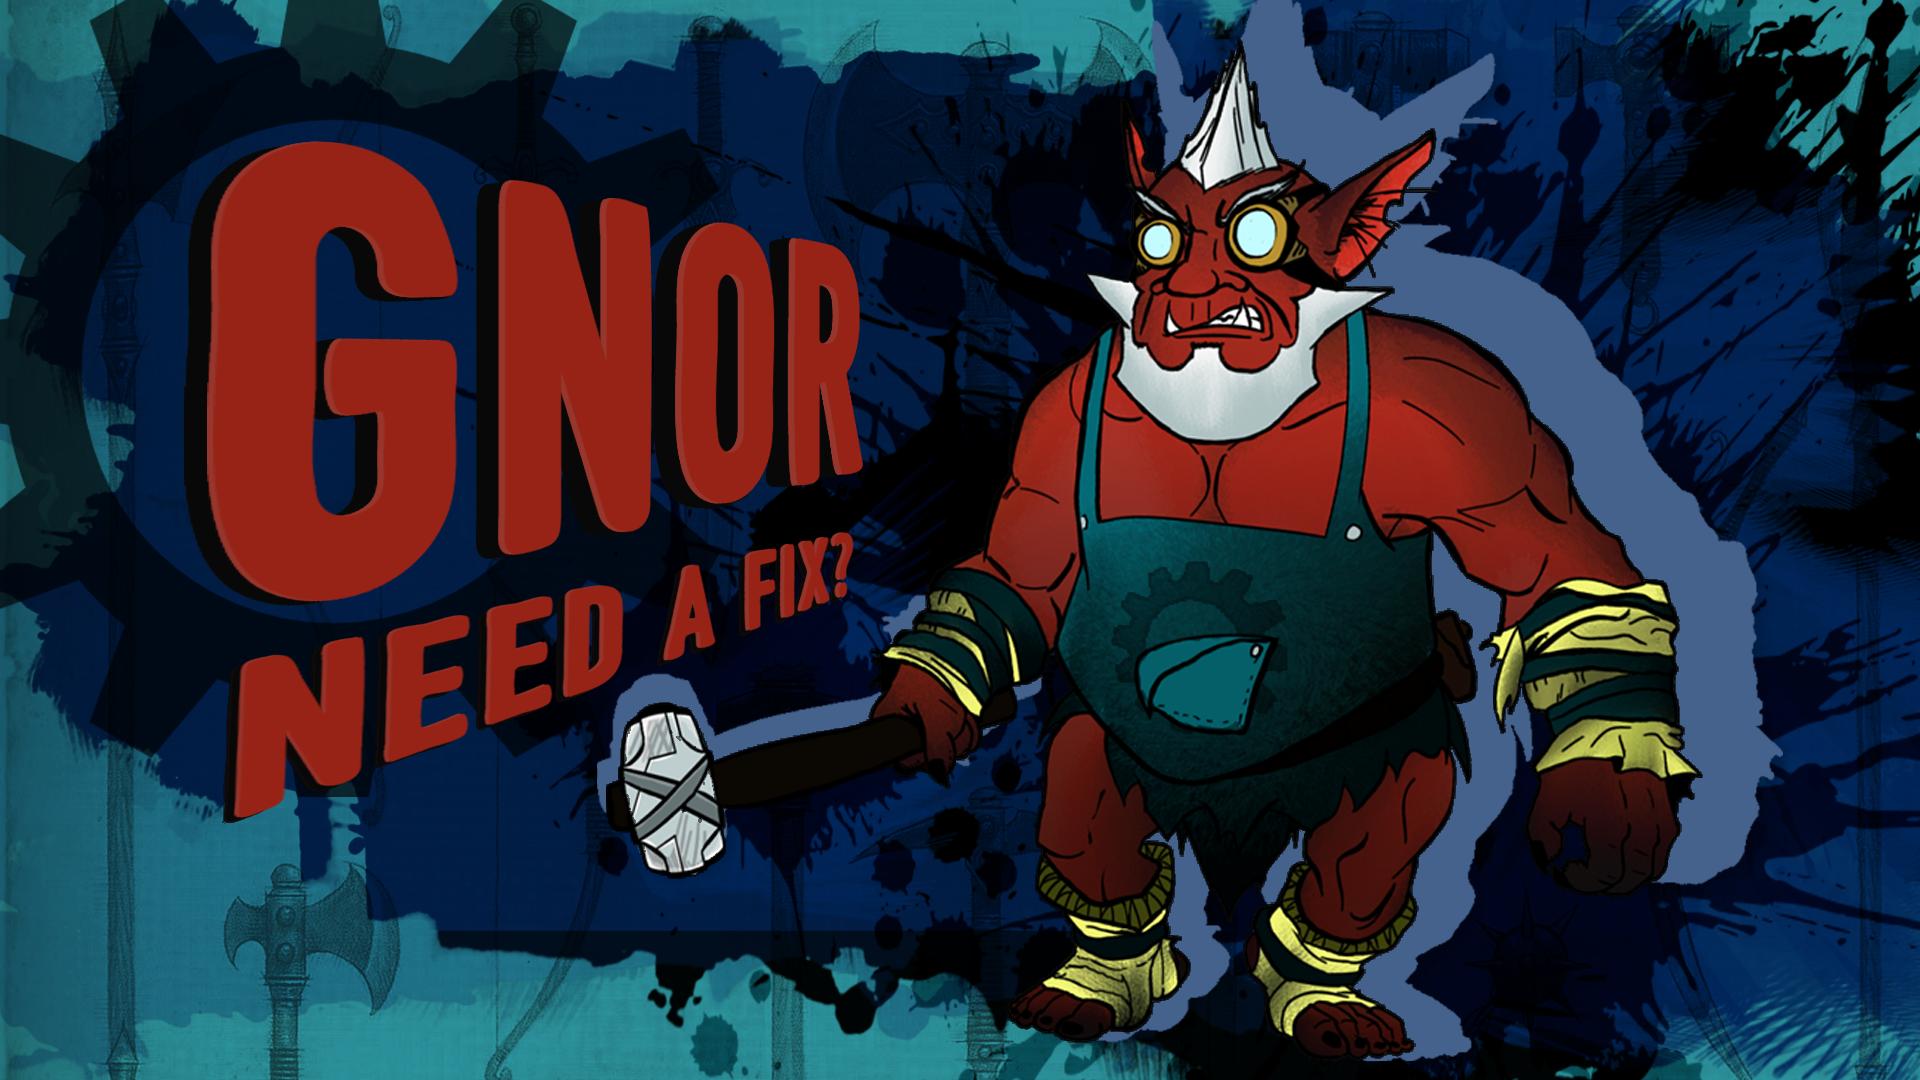 Gnor - Character Design